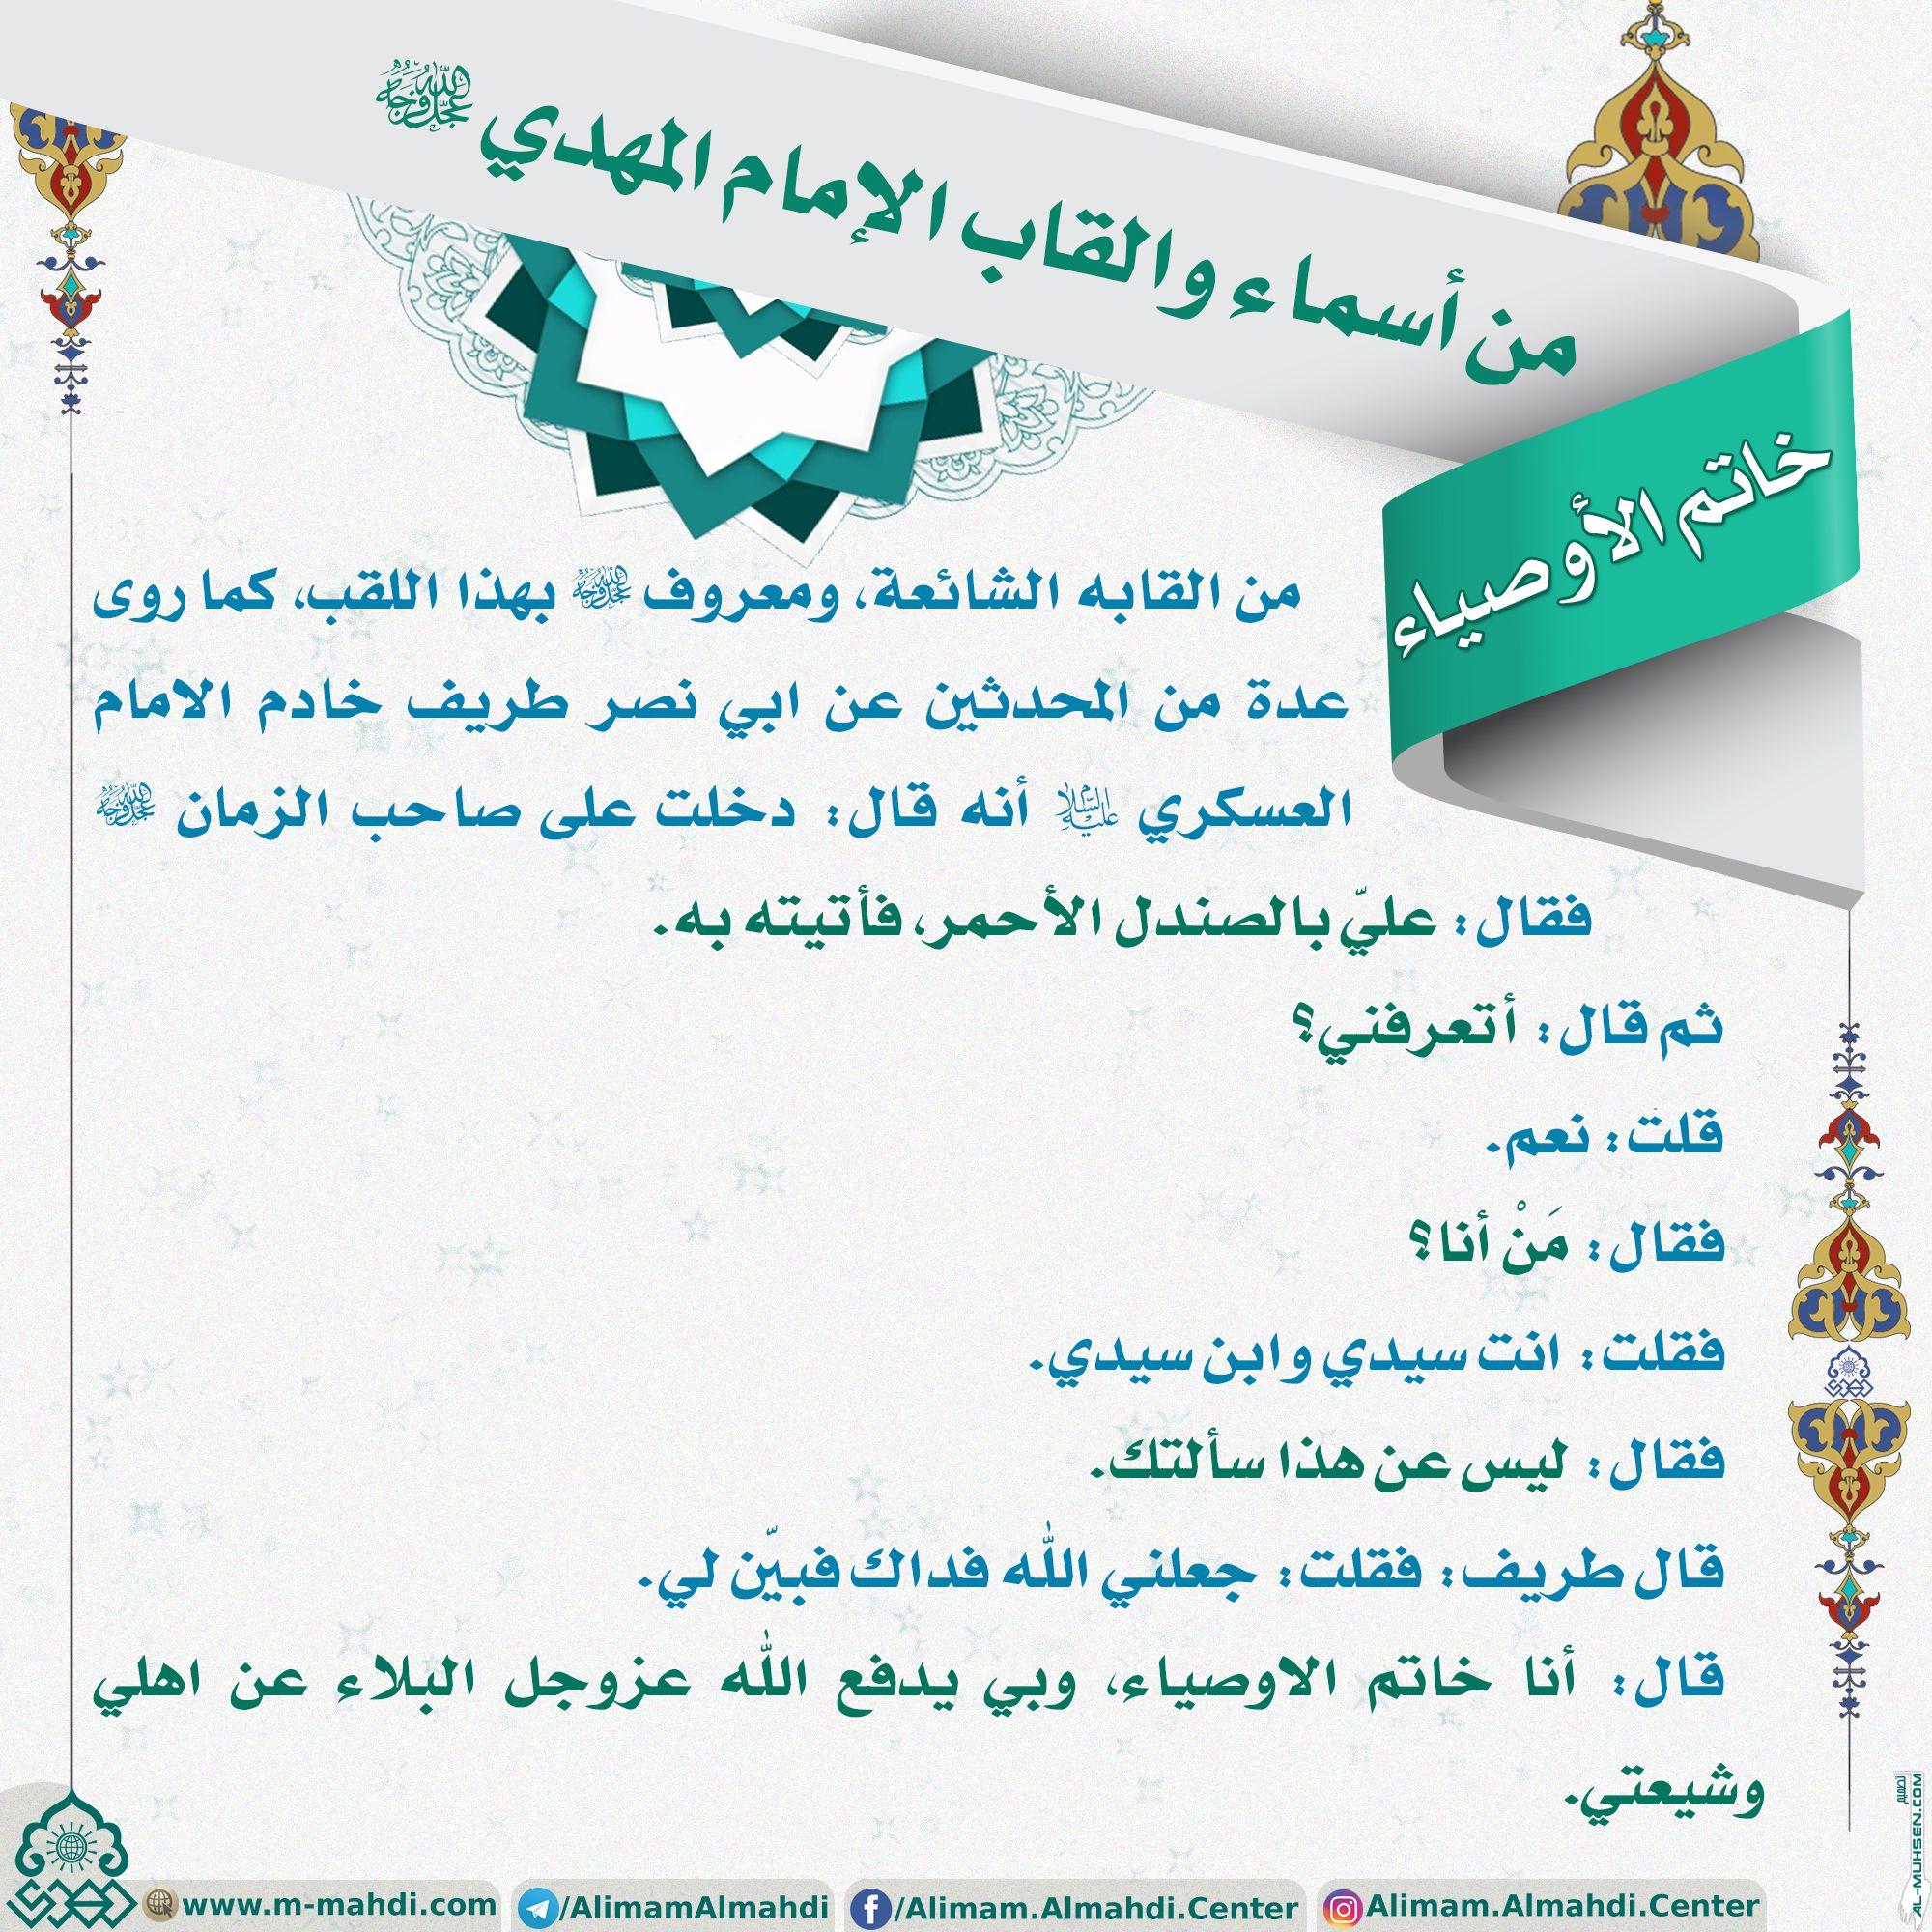 Pin By مركز الامام المهدي عليه السلام On اسماء والقاب الامام المهدي Pinterest Shia Islam And Islam